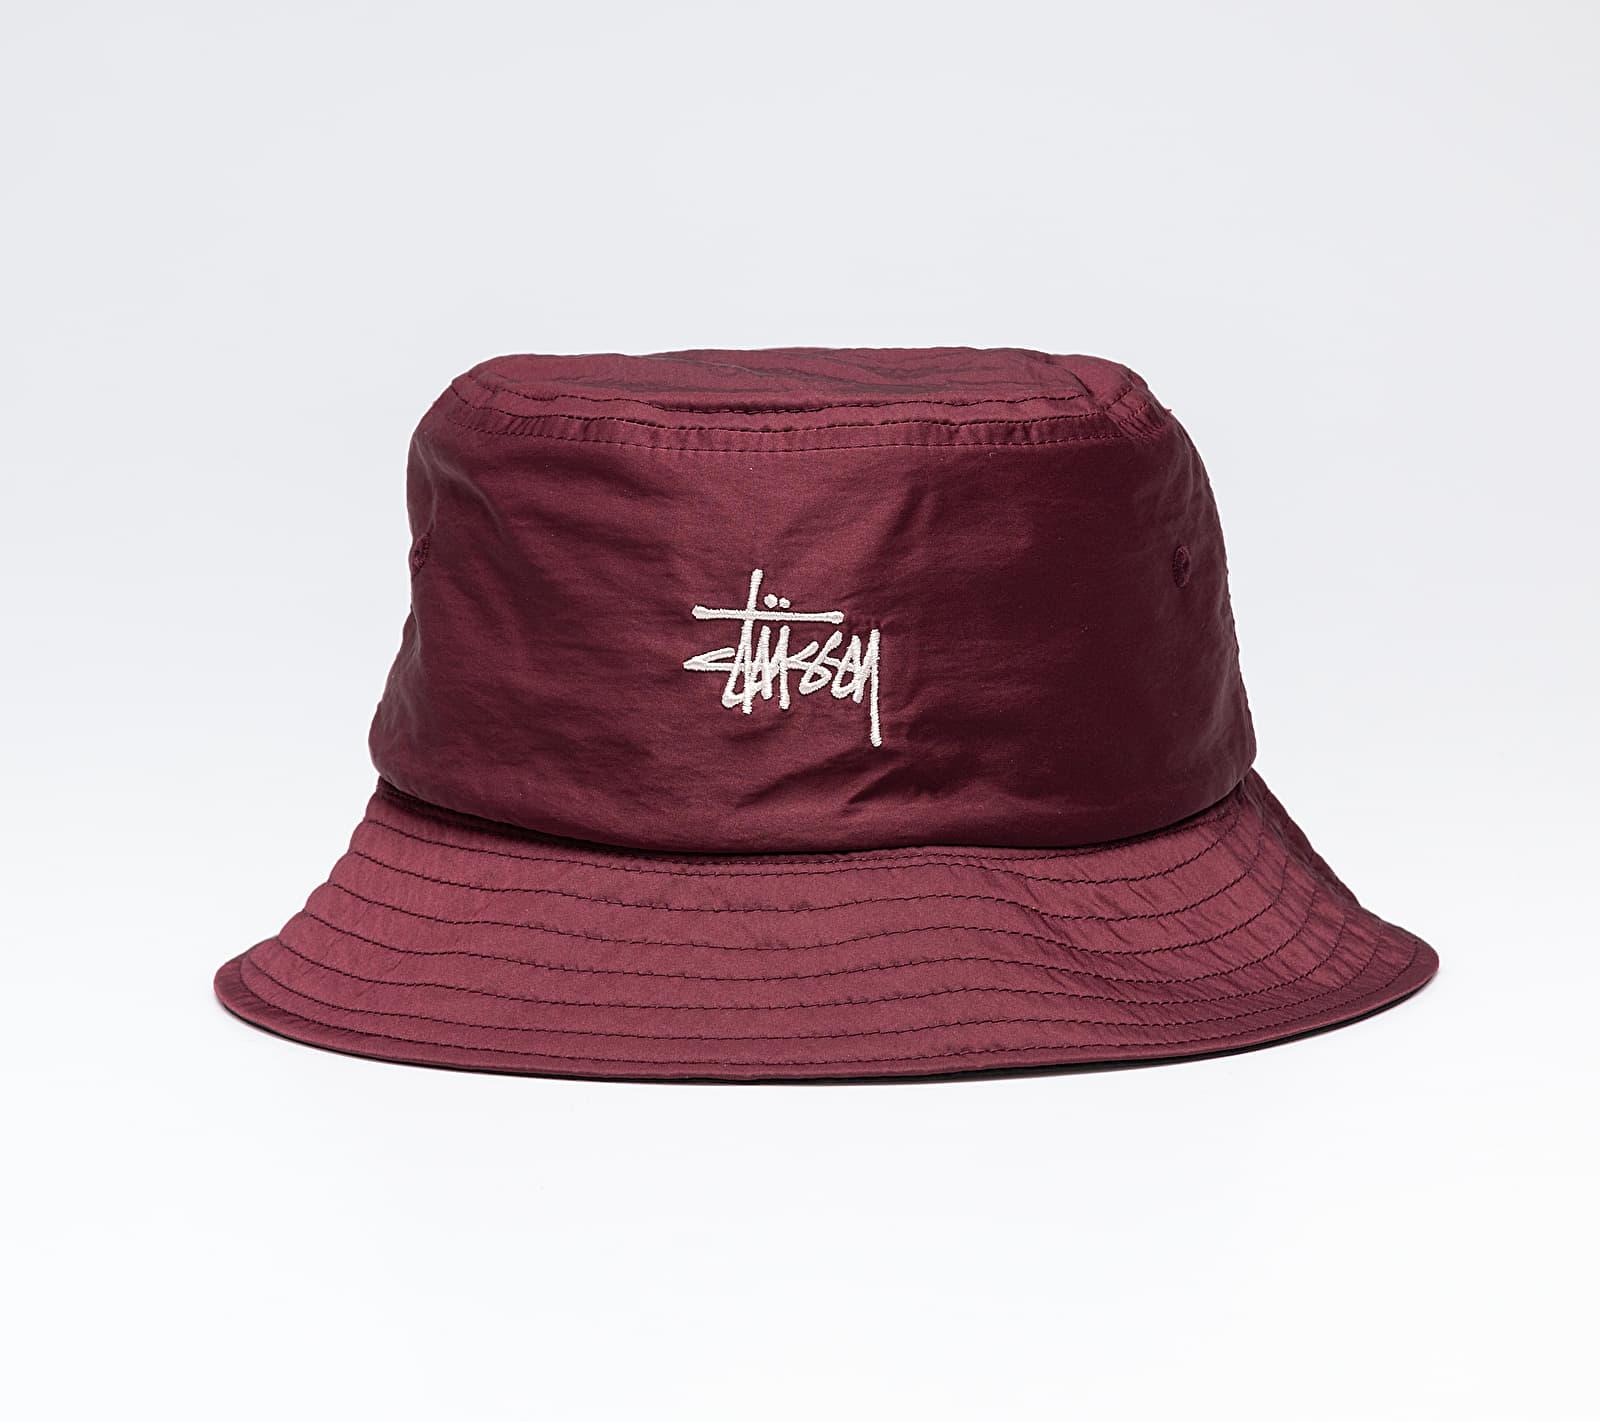 Stüssy Reversible Bucket Hat Berry, Red